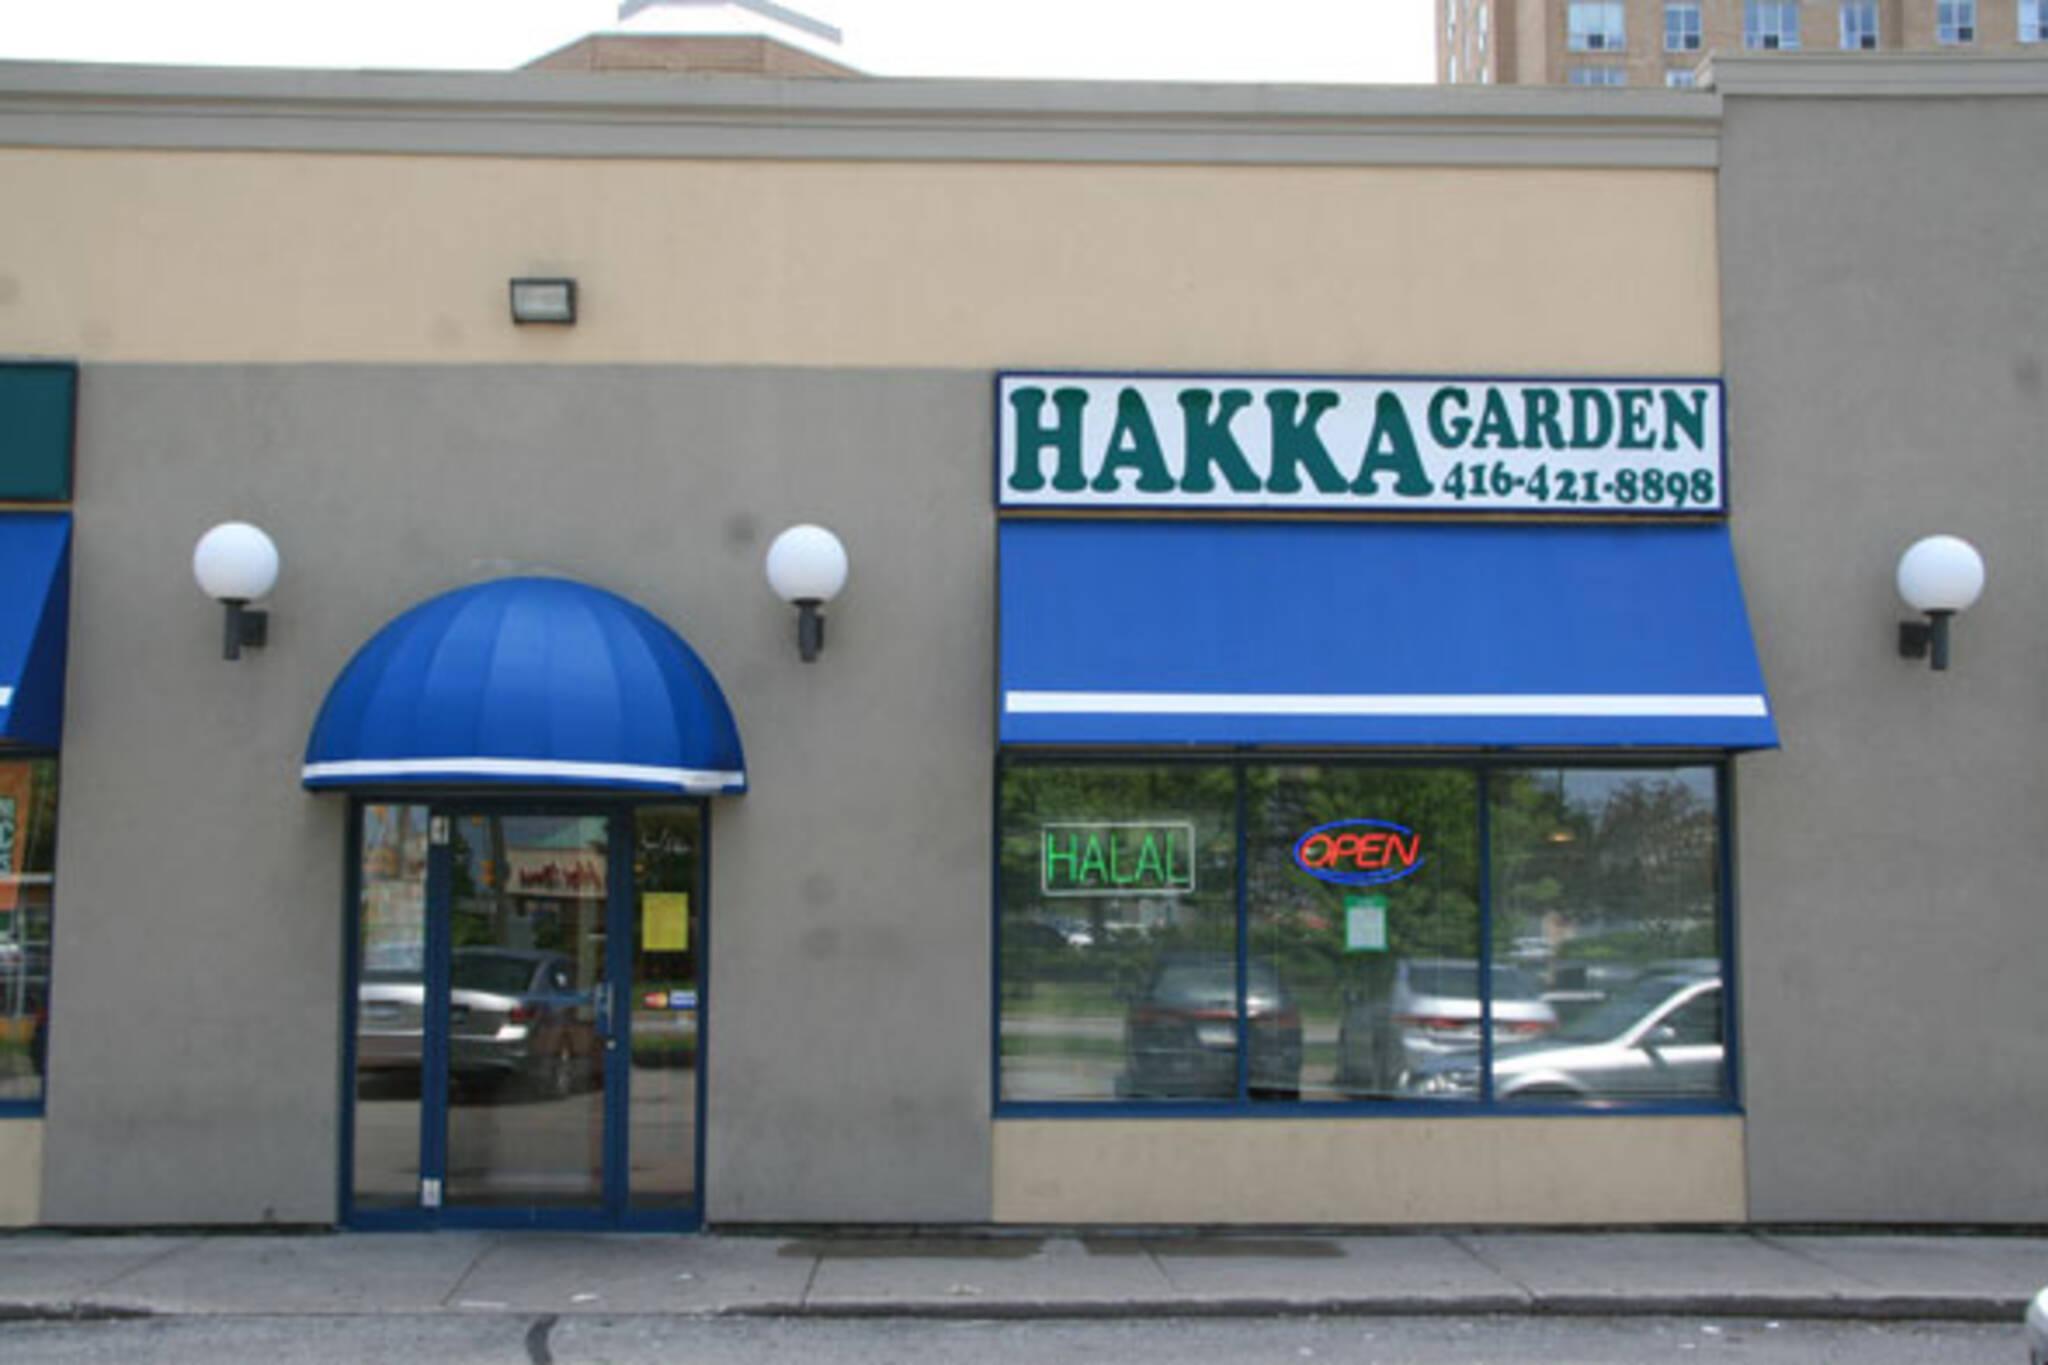 Hakka Garden